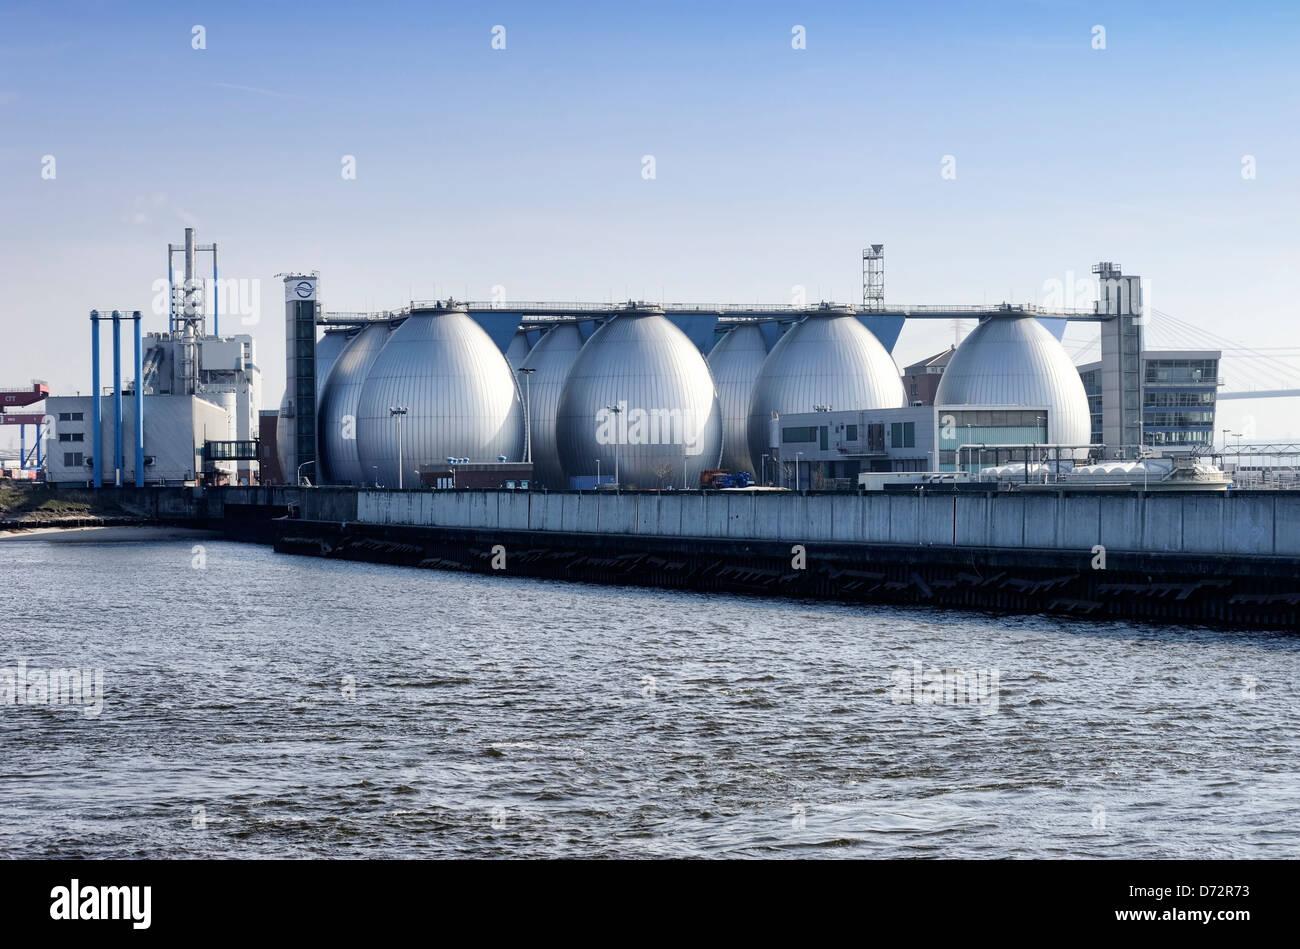 Sewage plant Köhlbrandhöft in Steinwerder, Hamburg, Germany, Europe - Stock Image